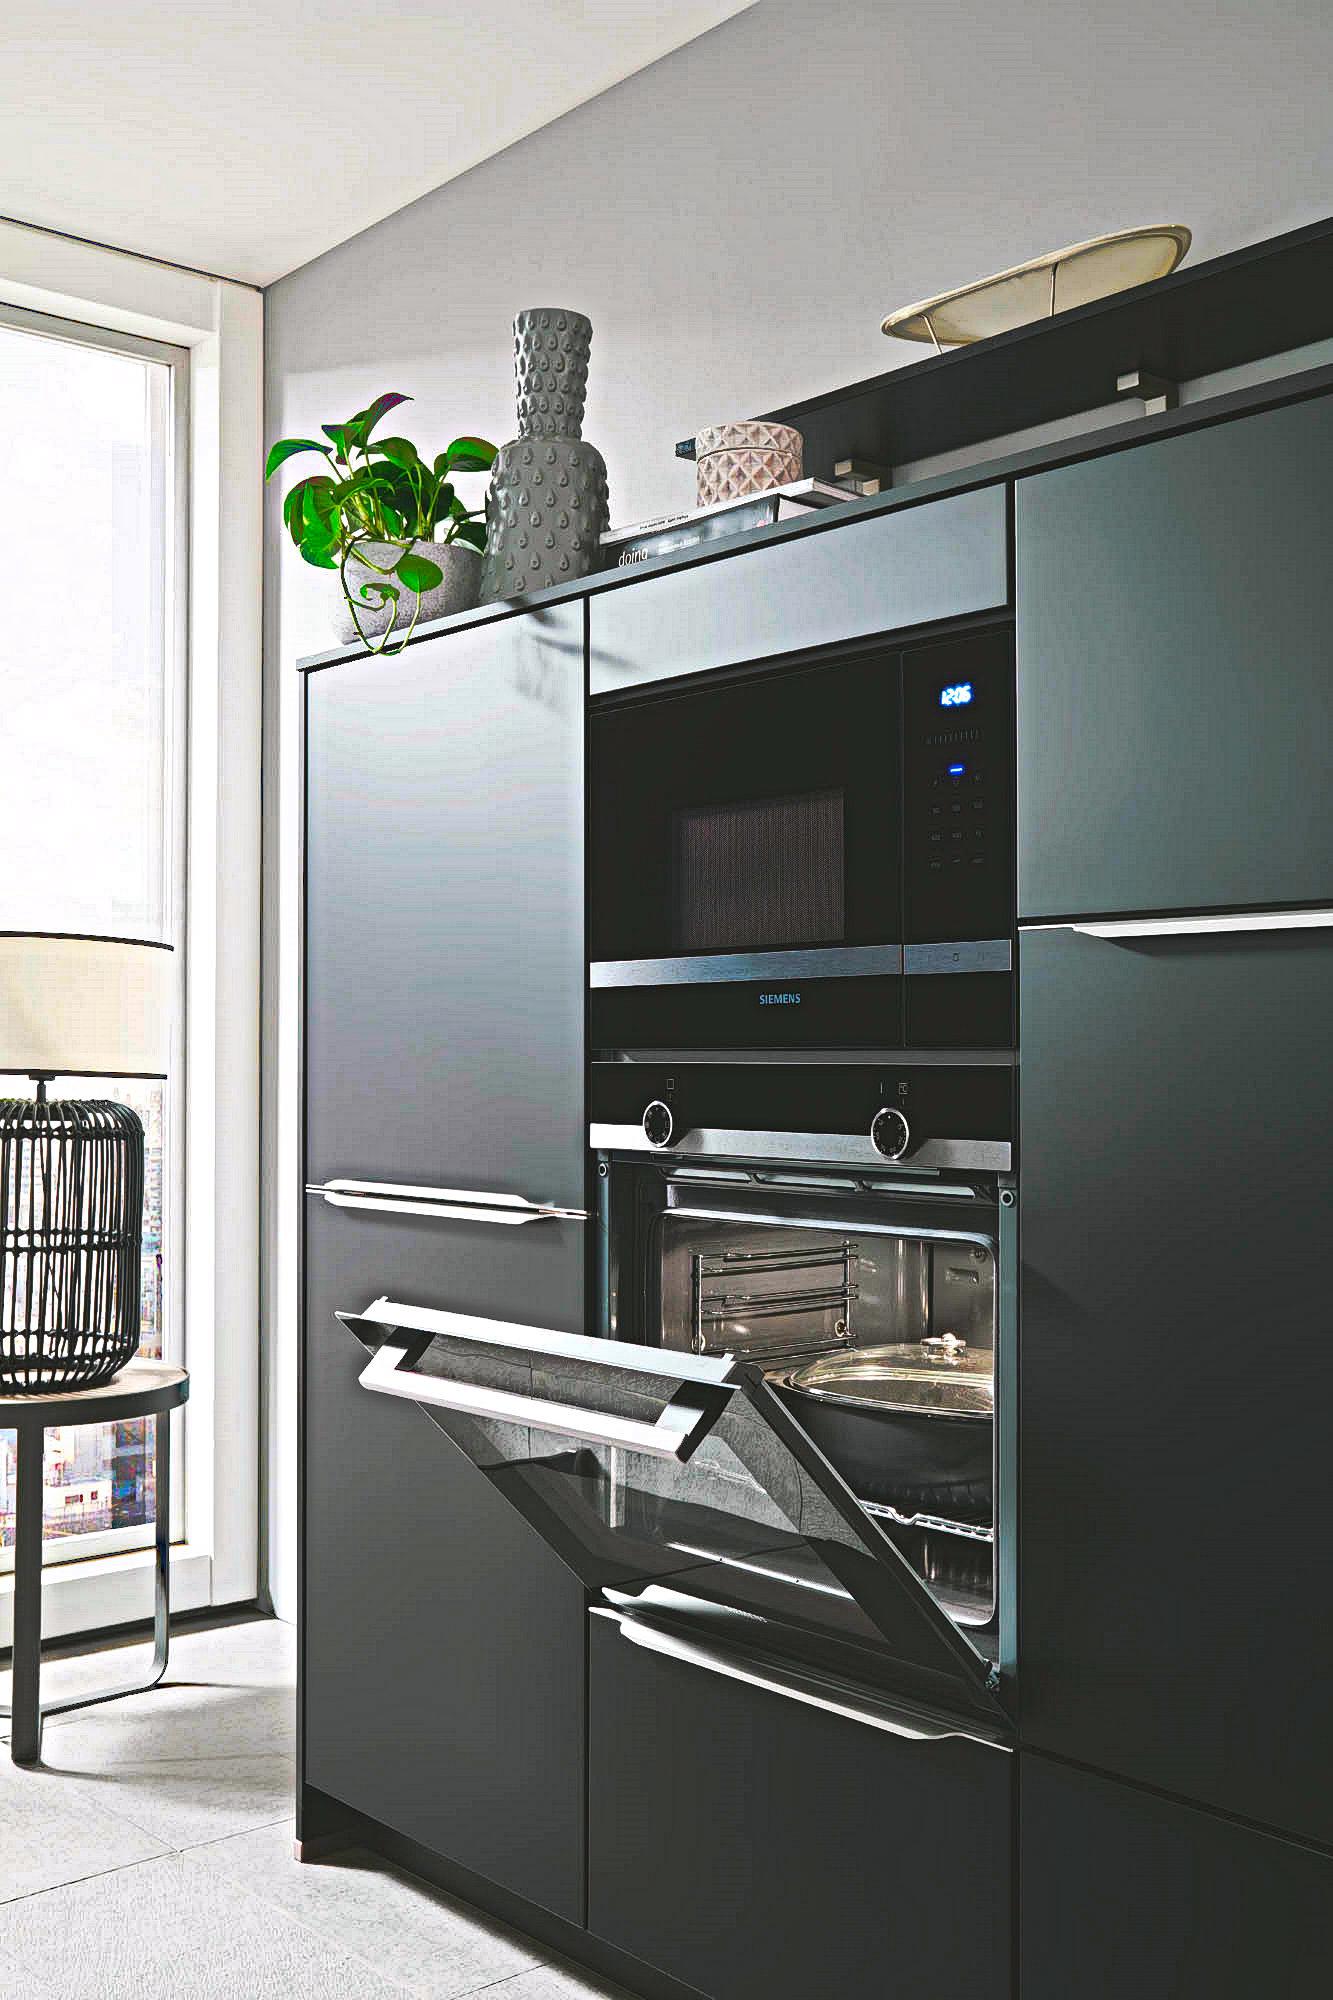 Full Size of Einbauküche Elektrogeräte Miele Einbauküchen Mit Elektrogeräten Ohne Kühlschrank Einbauküche Gebraucht Mit Elektrogeräten Ebay Einbauküche Mit Elektrogeräten Roller Küche Einbauküche Mit Elektrogeräten